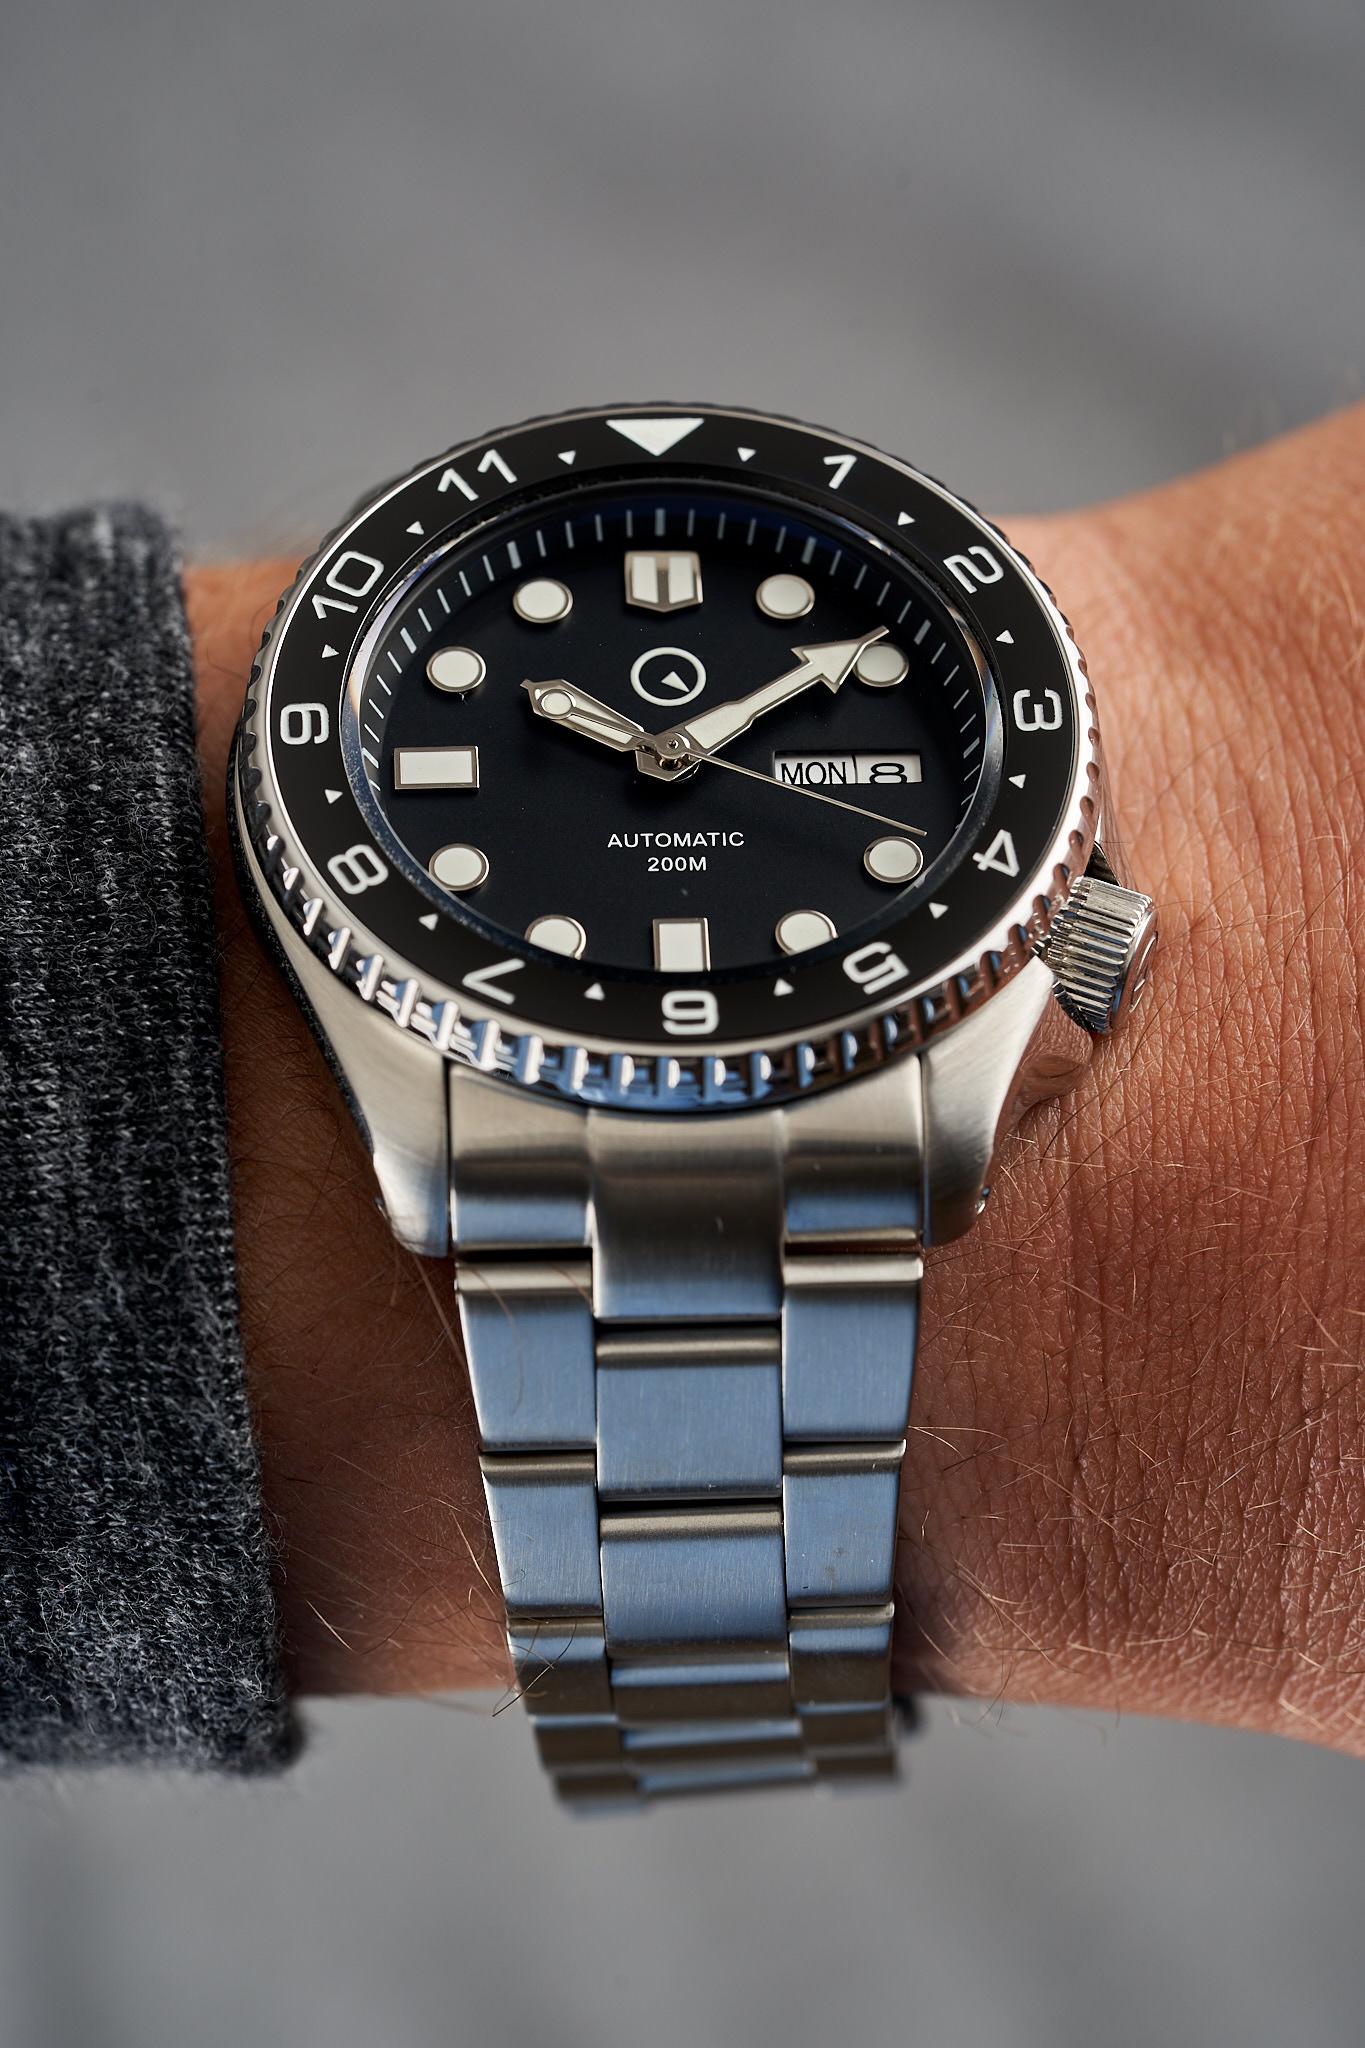 Islander-Watch-ISL-01-Long-Island-Watch-wrist-shot